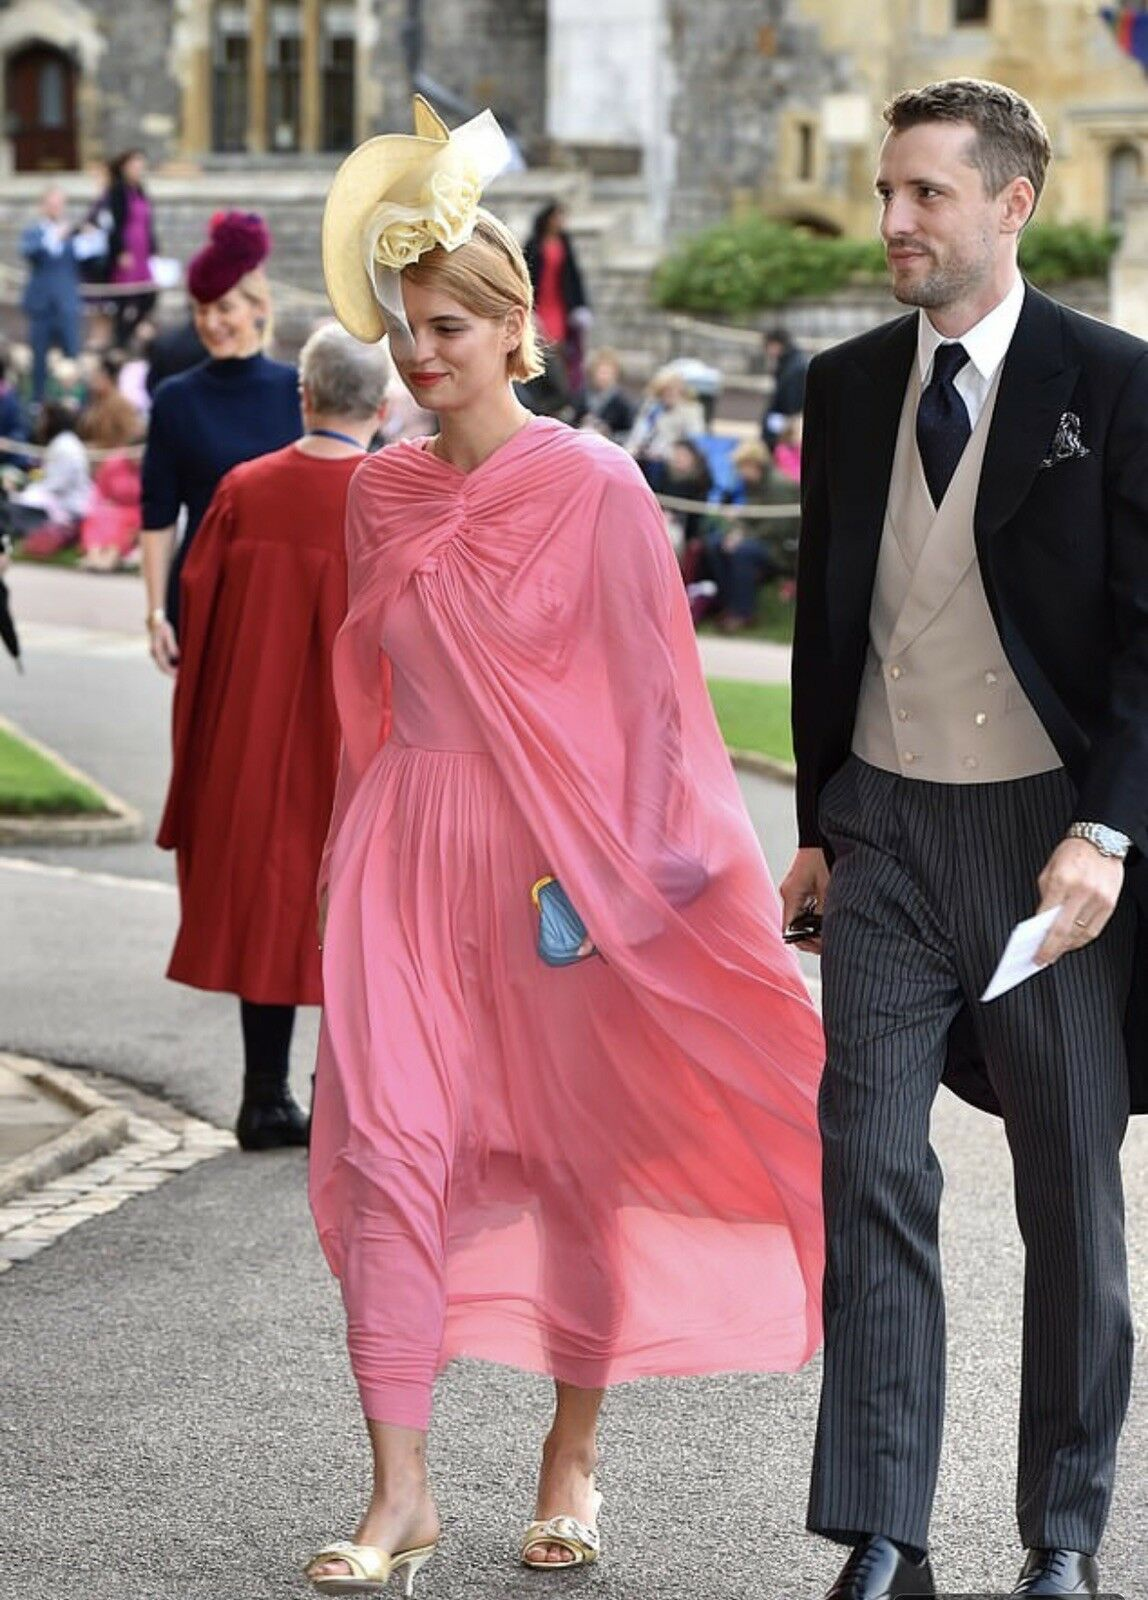 Seen @ The Royal Wedding Celine Phoebe Philo Pink Jersey Cape Runway Dress 2017